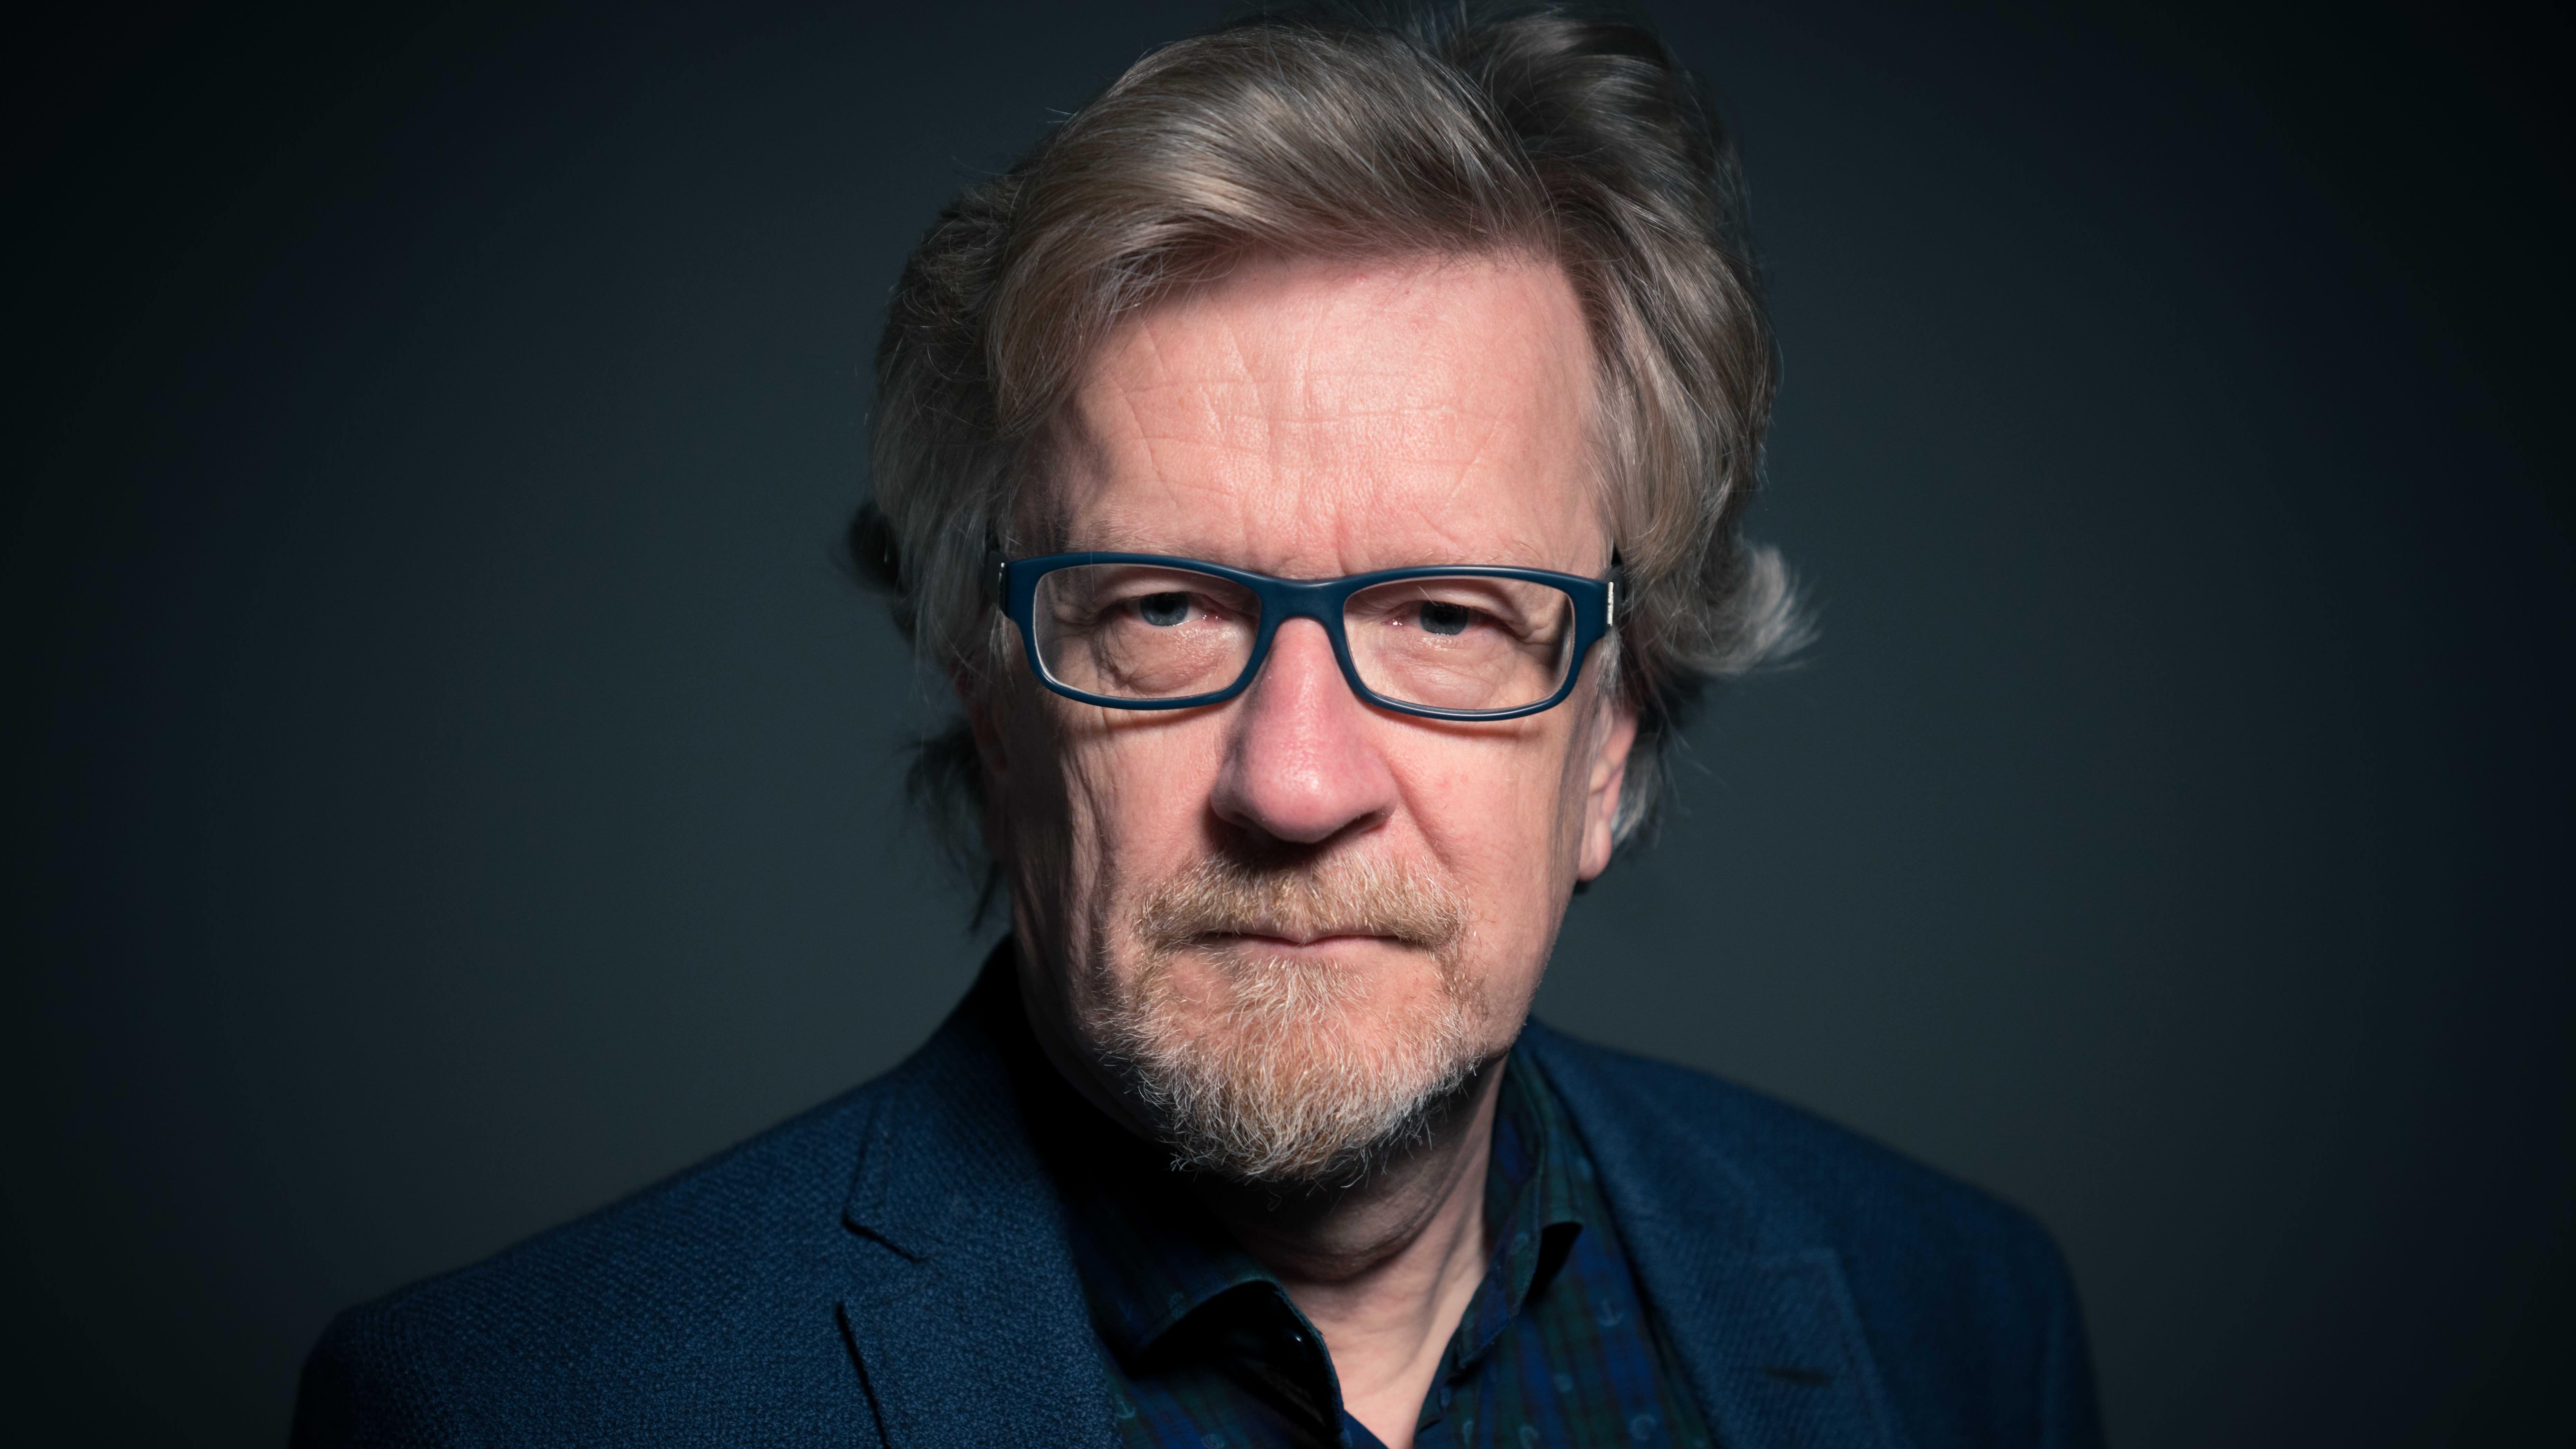 Kari Enqvist, Helsinki, 23.10.2018